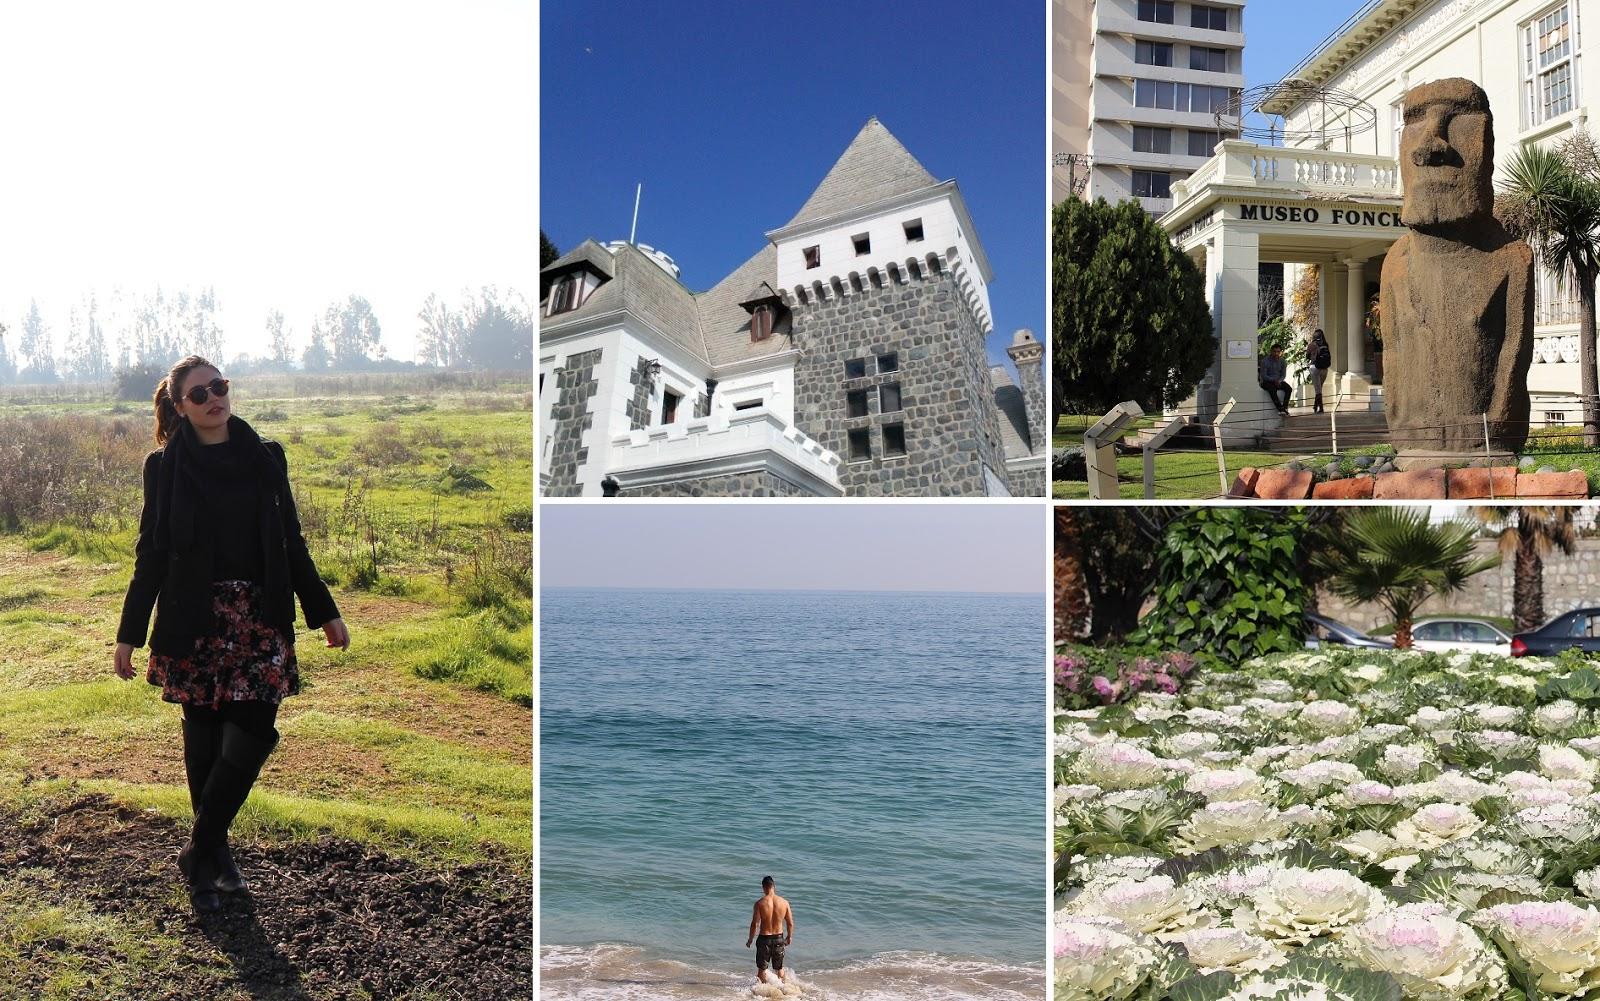 guia Chile Viagem a Valparaíso e Viña del Mar Ana do dia